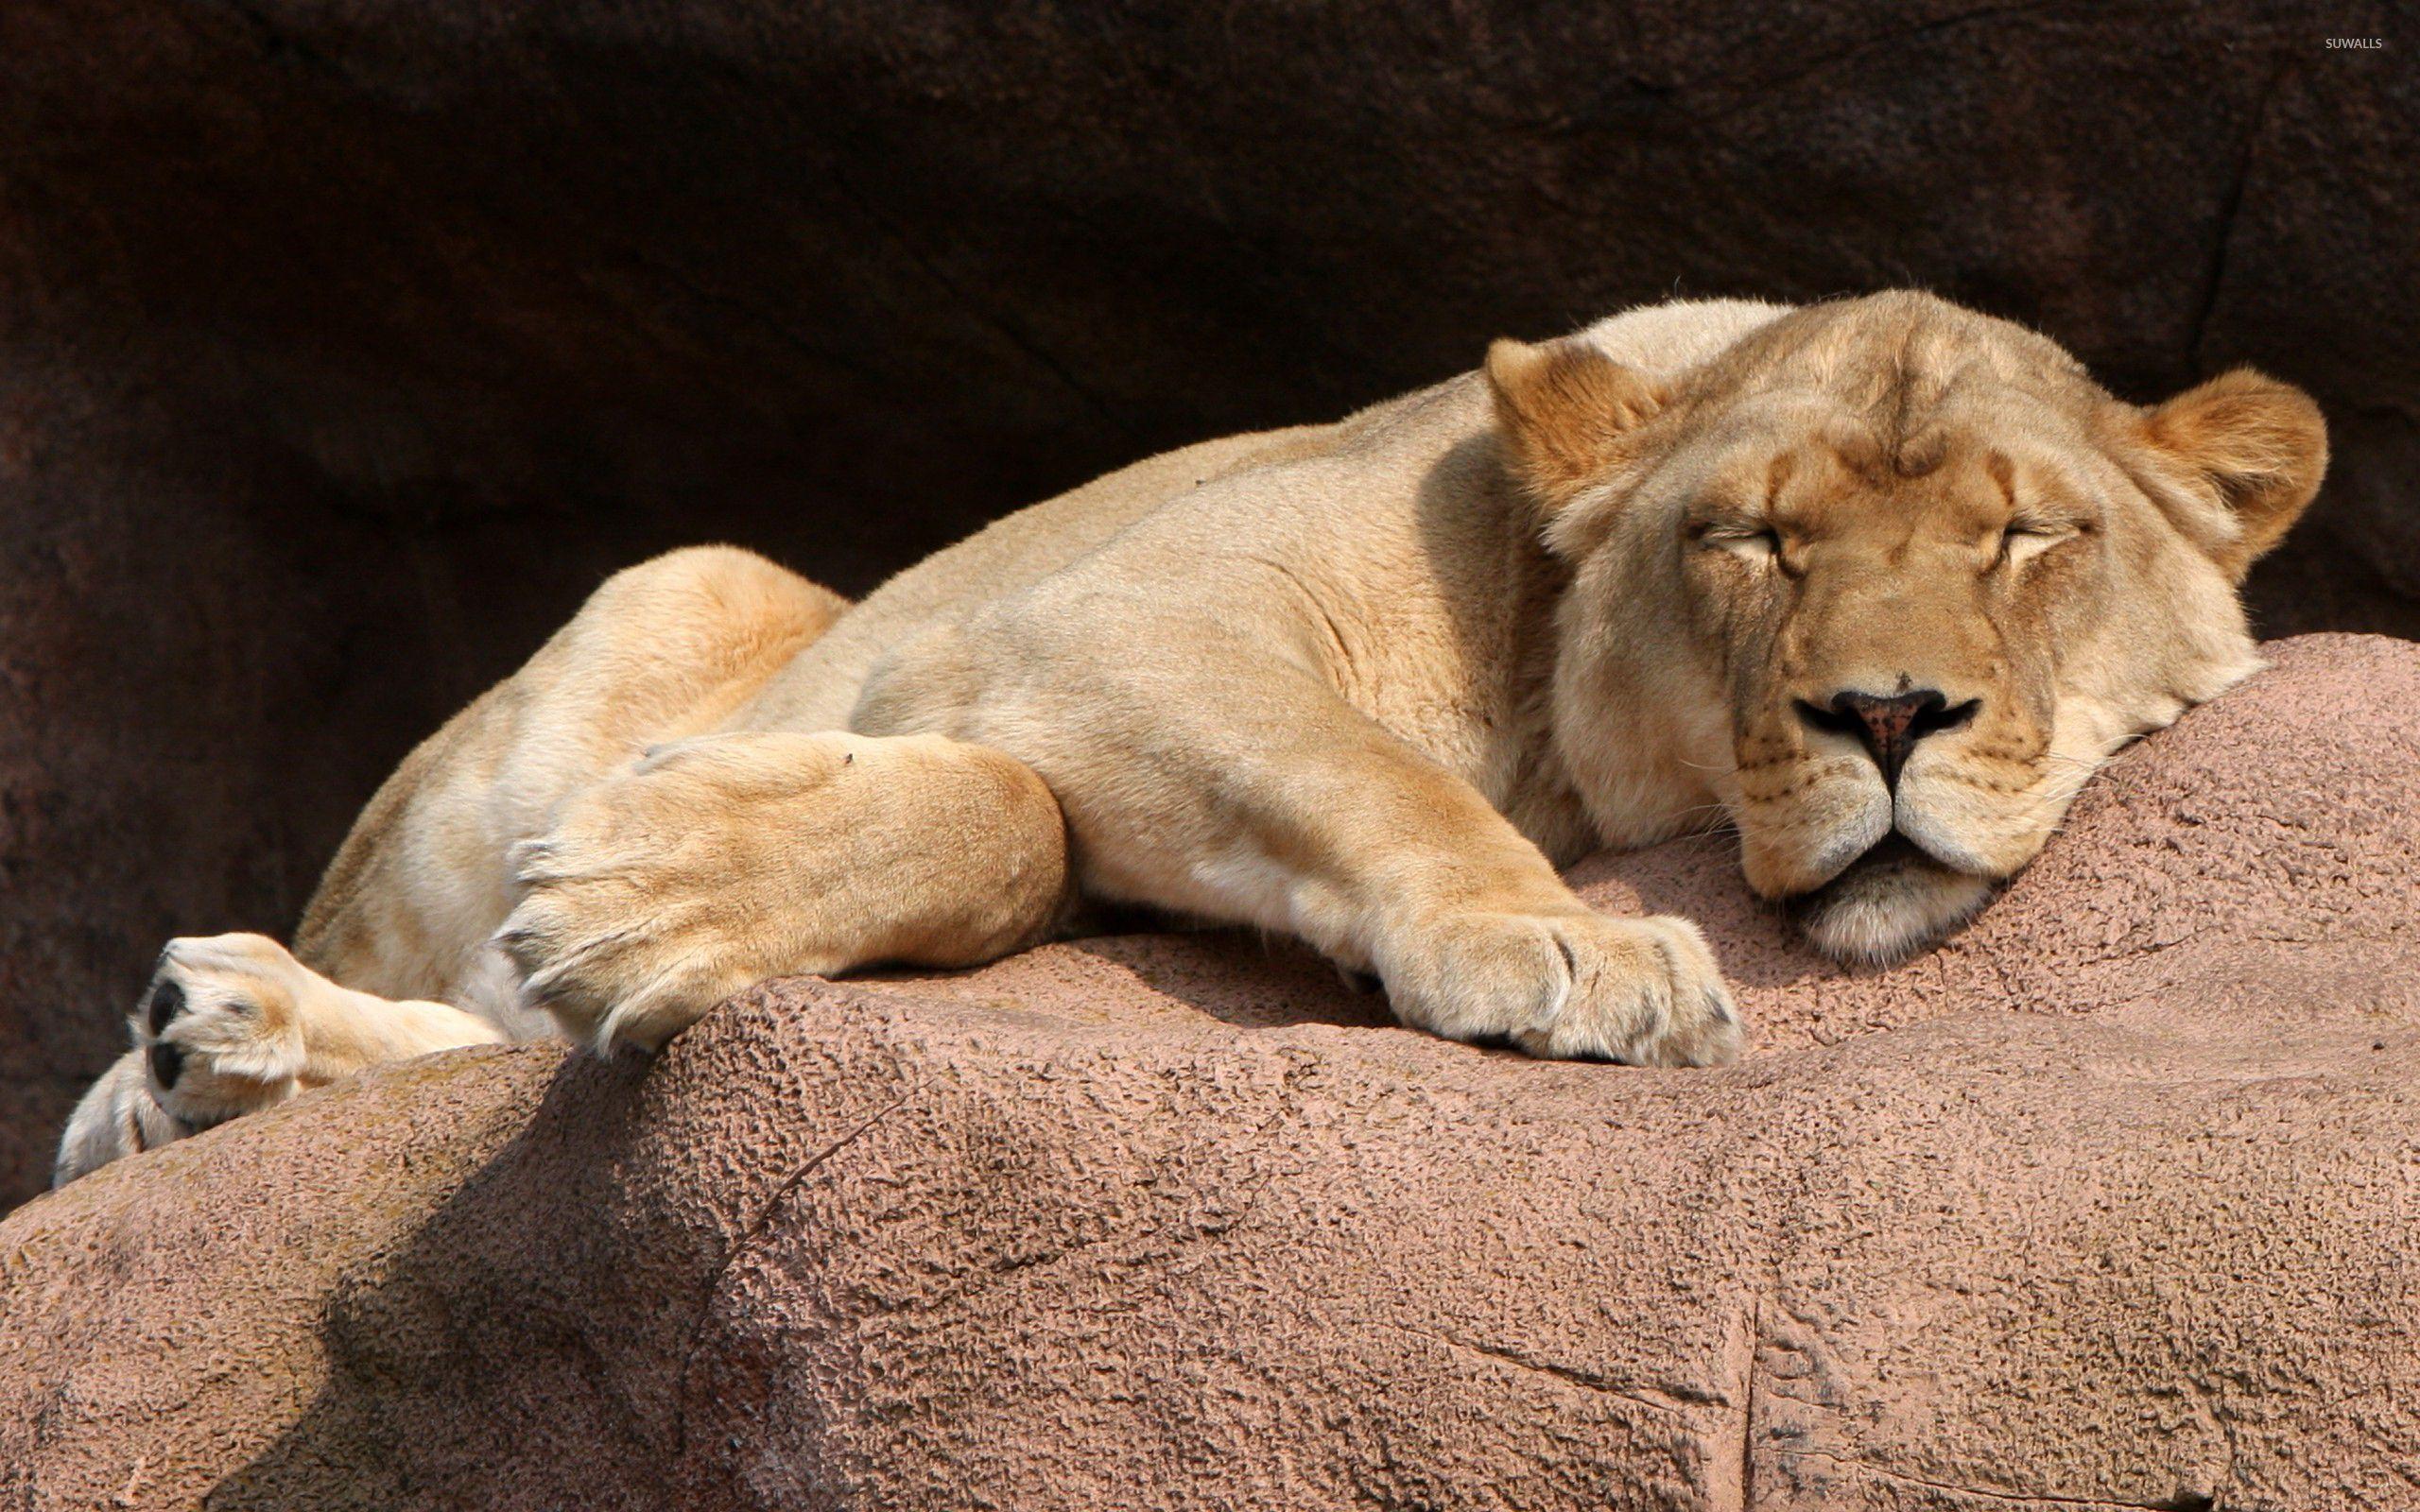 Lioness sleeping wallpaper - Animal wallpapers - #33547